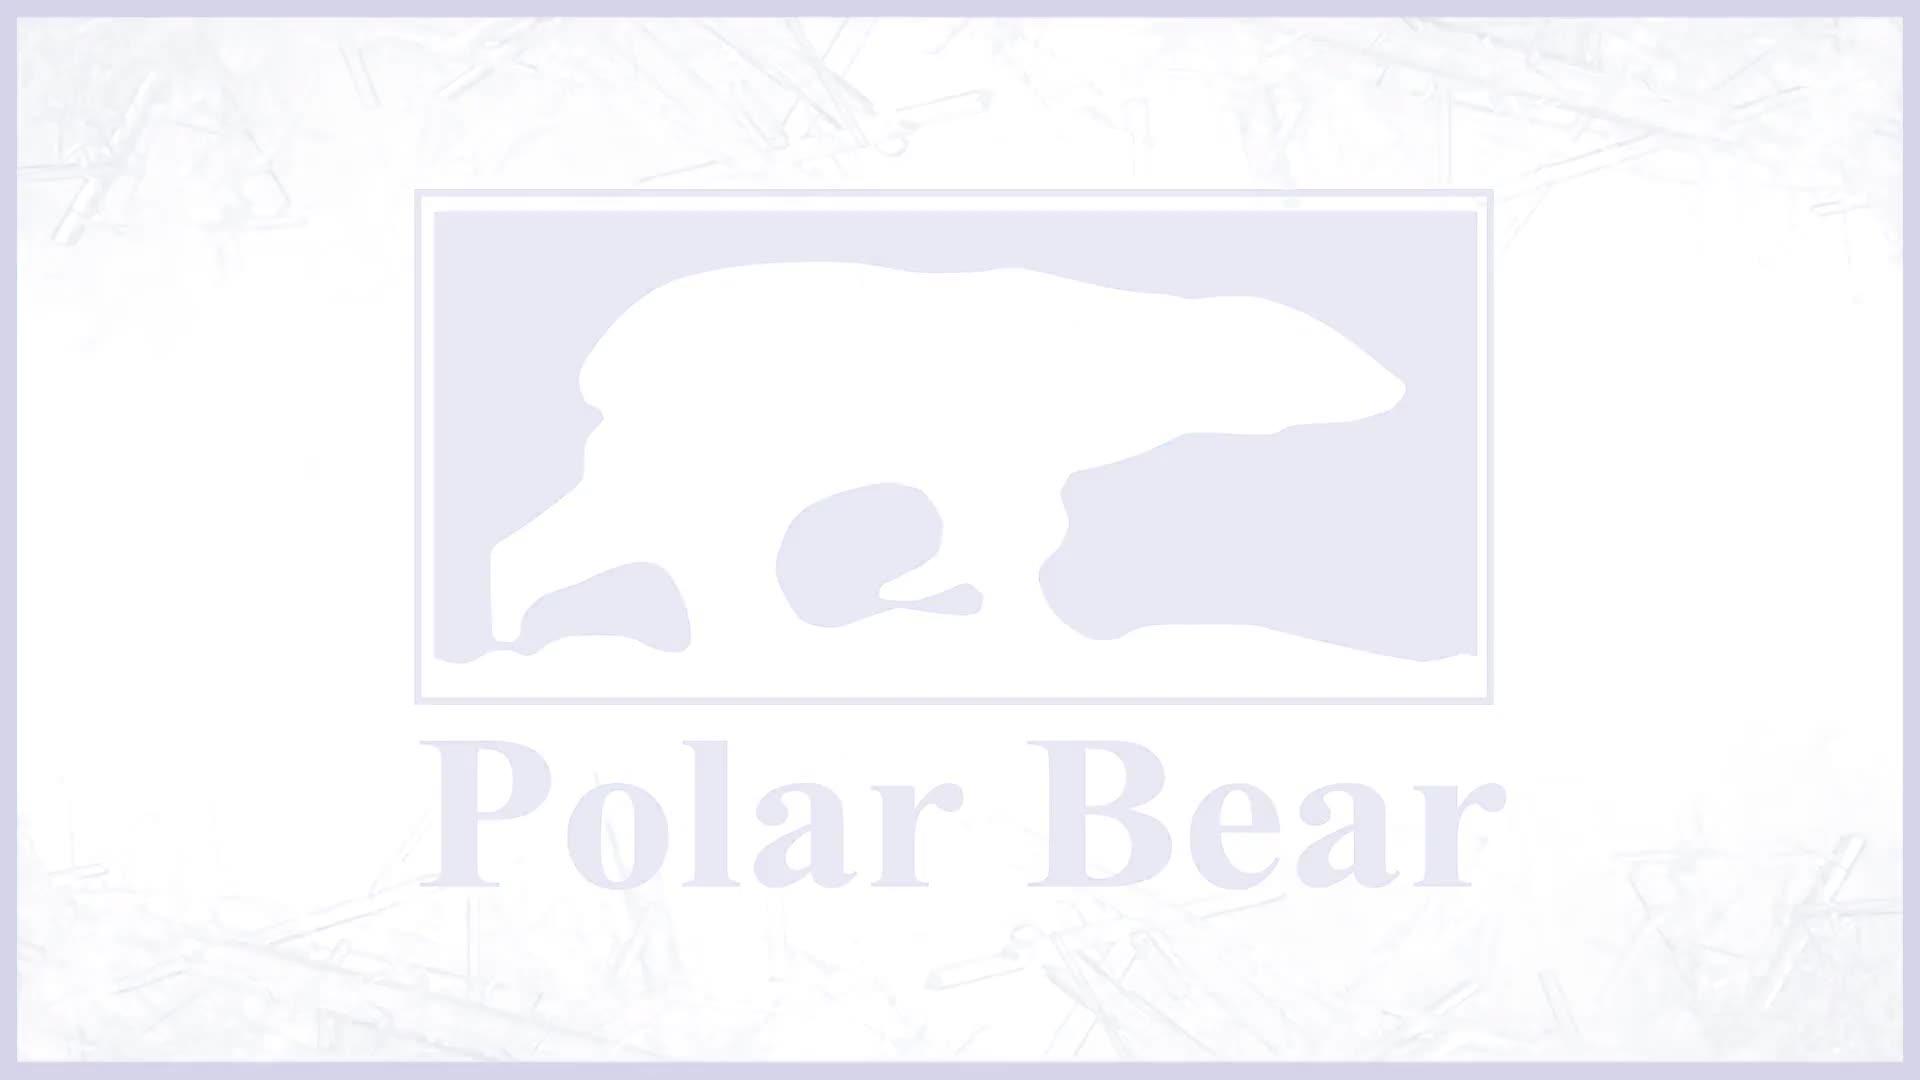 Polar Bear Timmins - Siding Materials - 705-268-3006